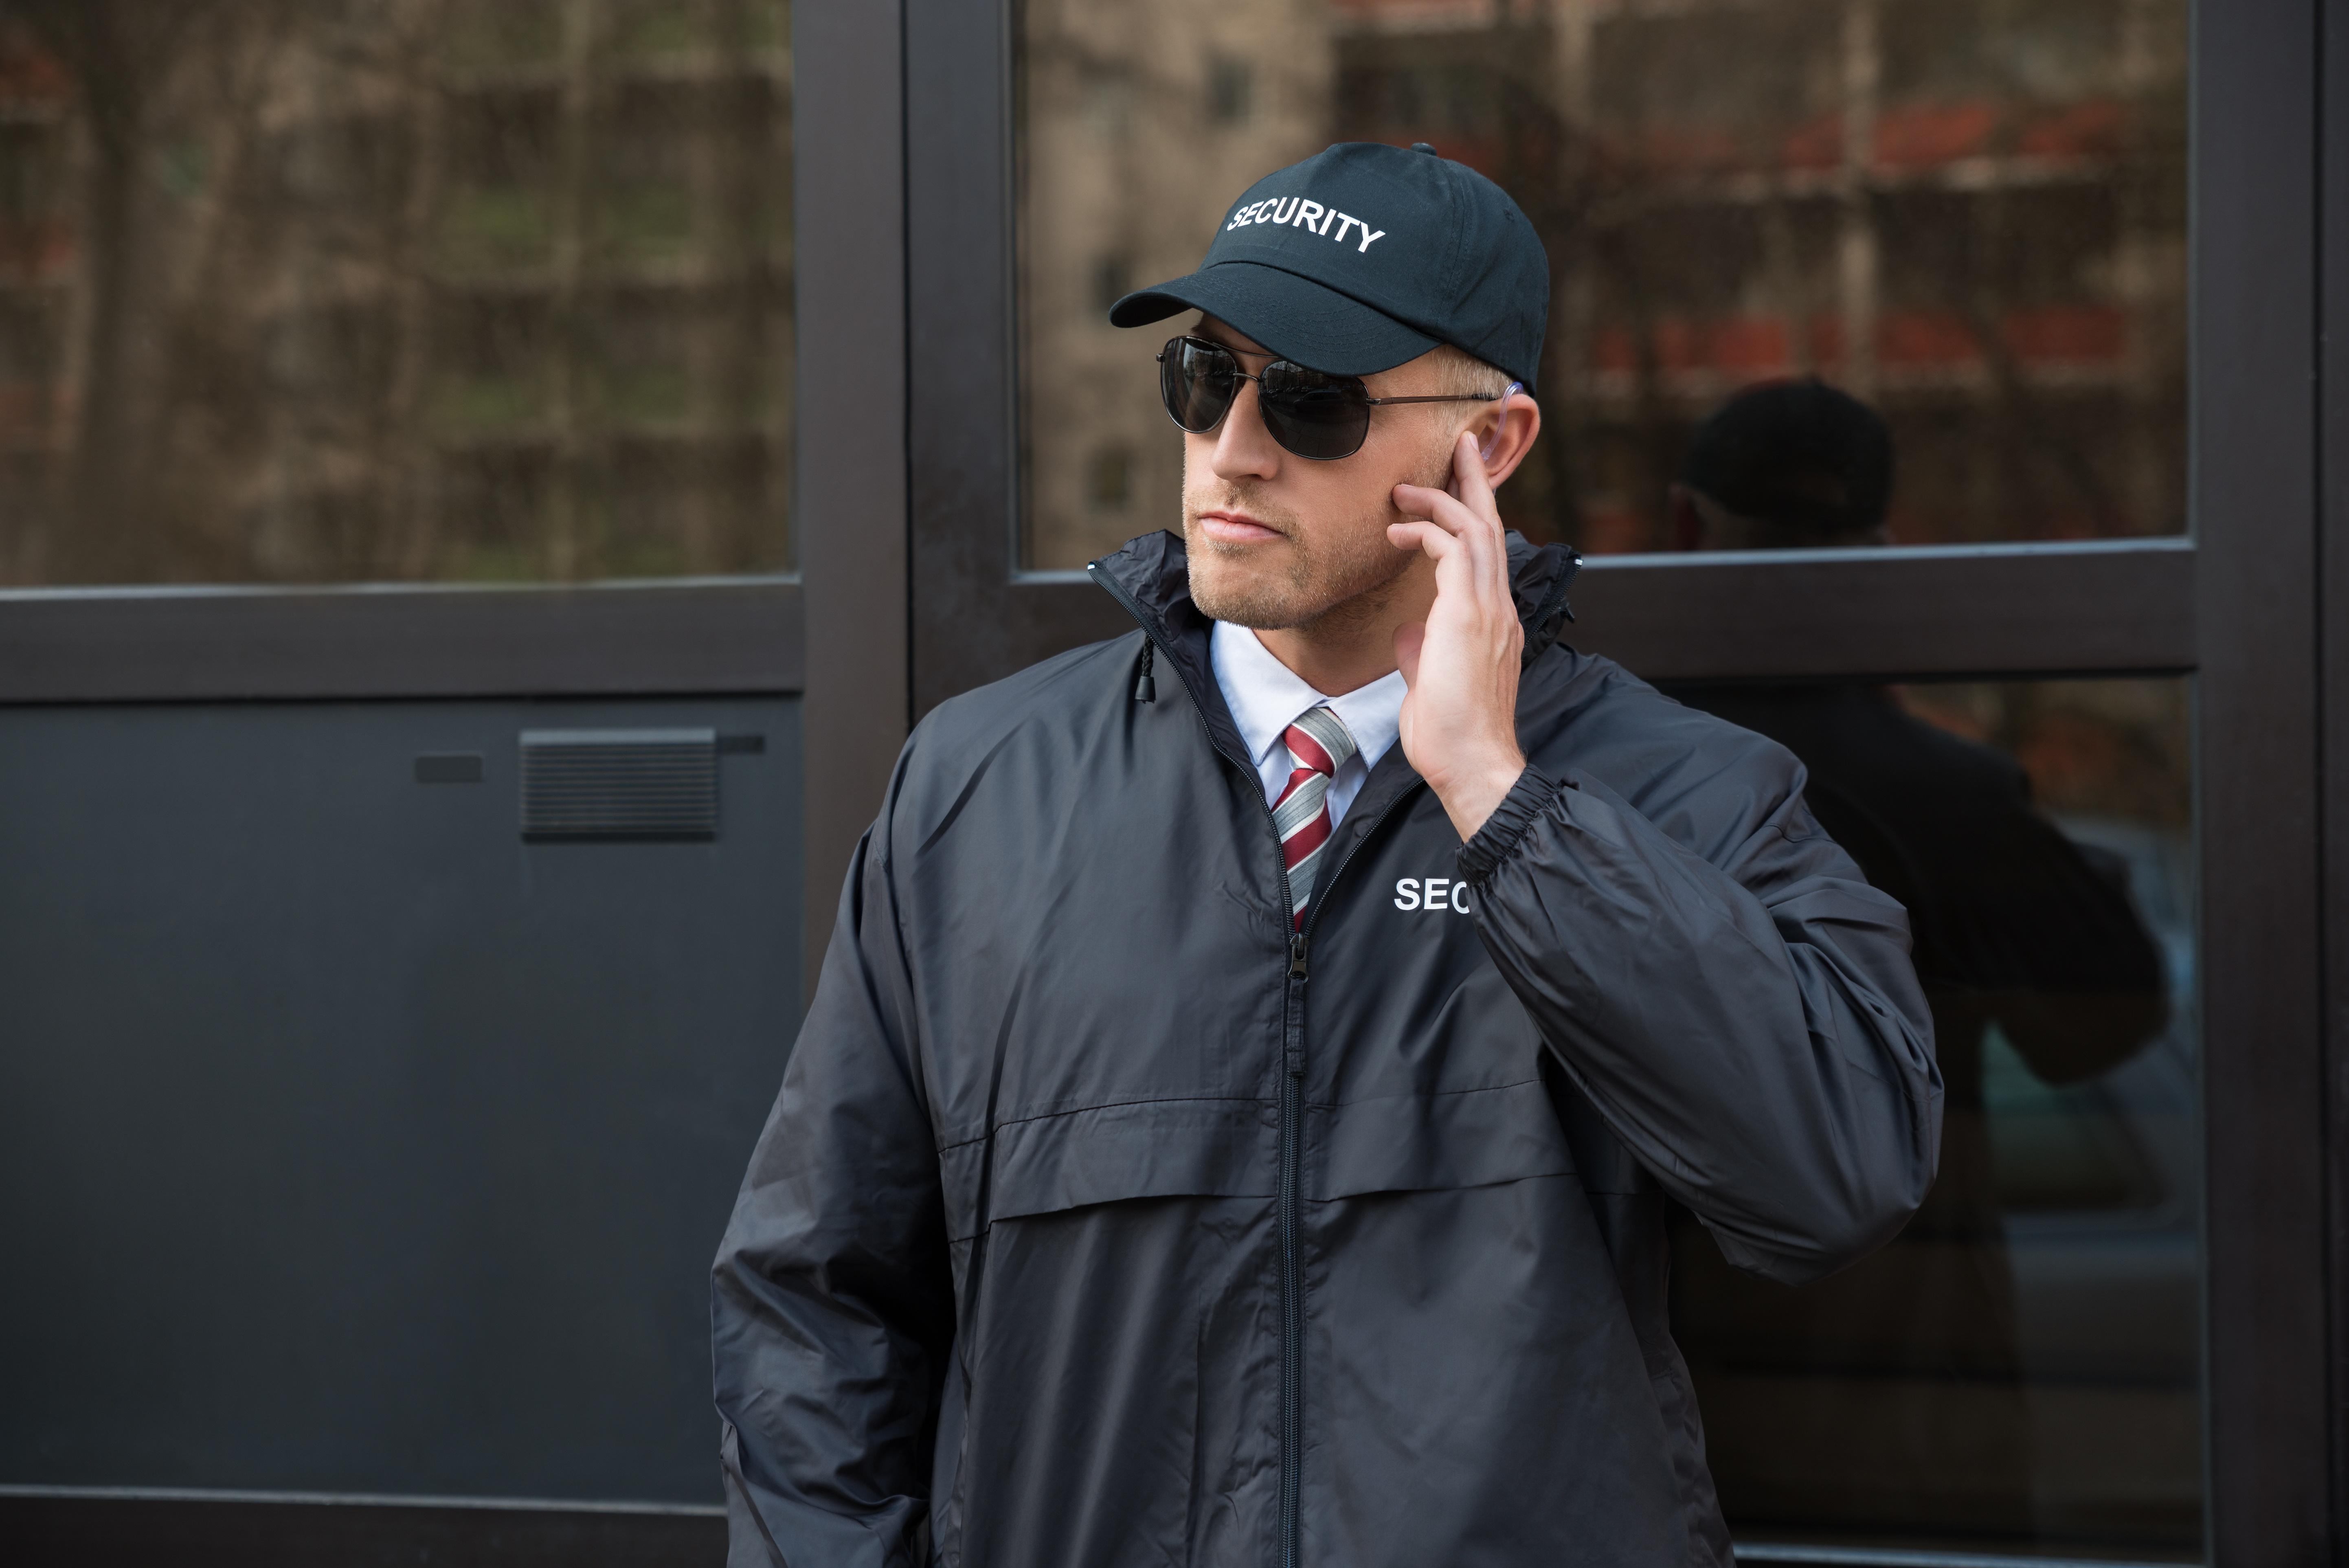 Secret Service.jpg